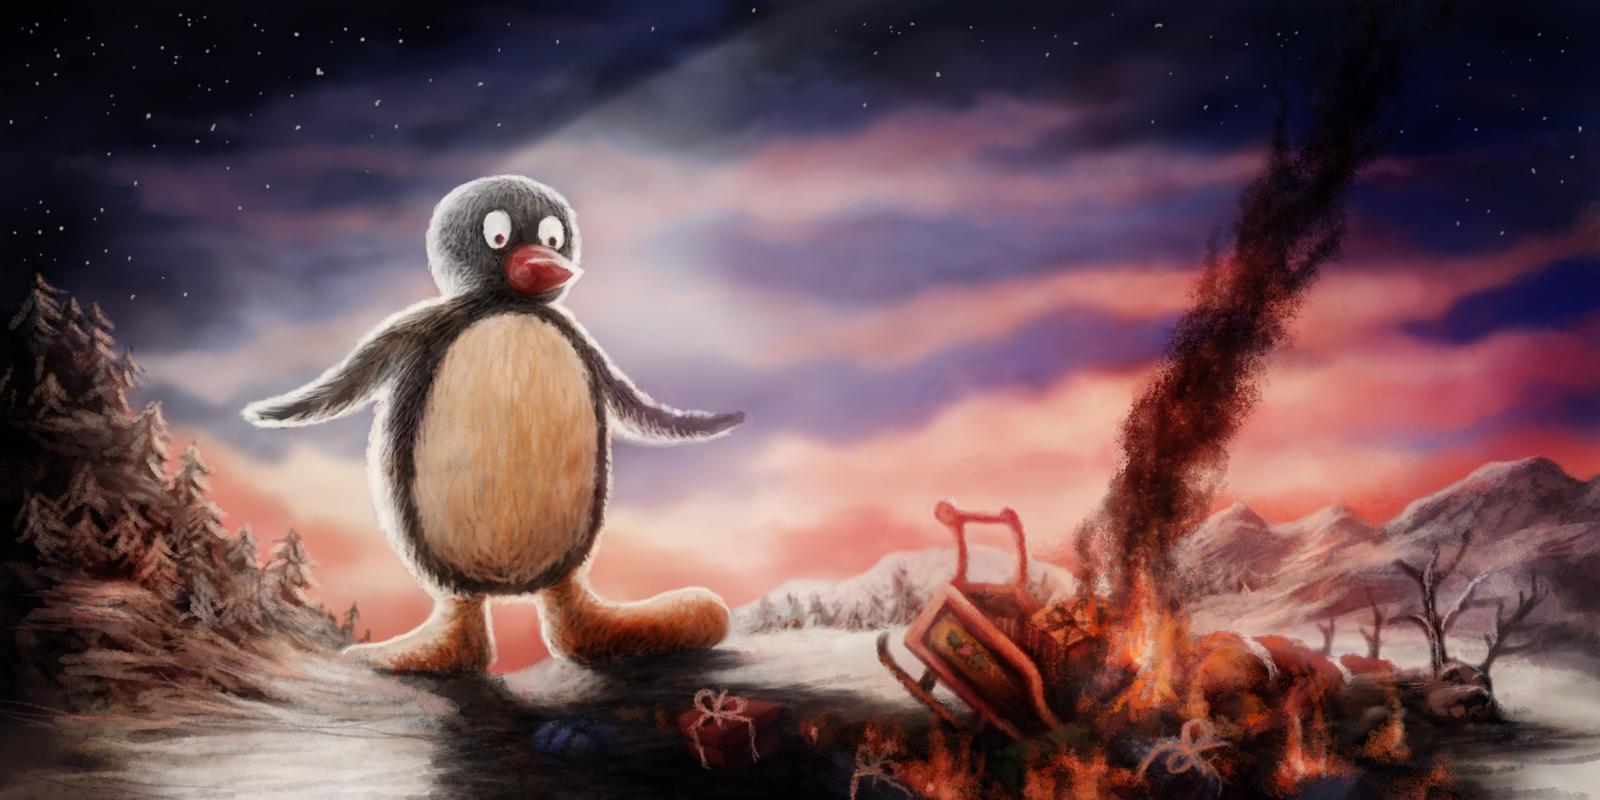 Reign of Pingu by JakobHansson on DeviantArt